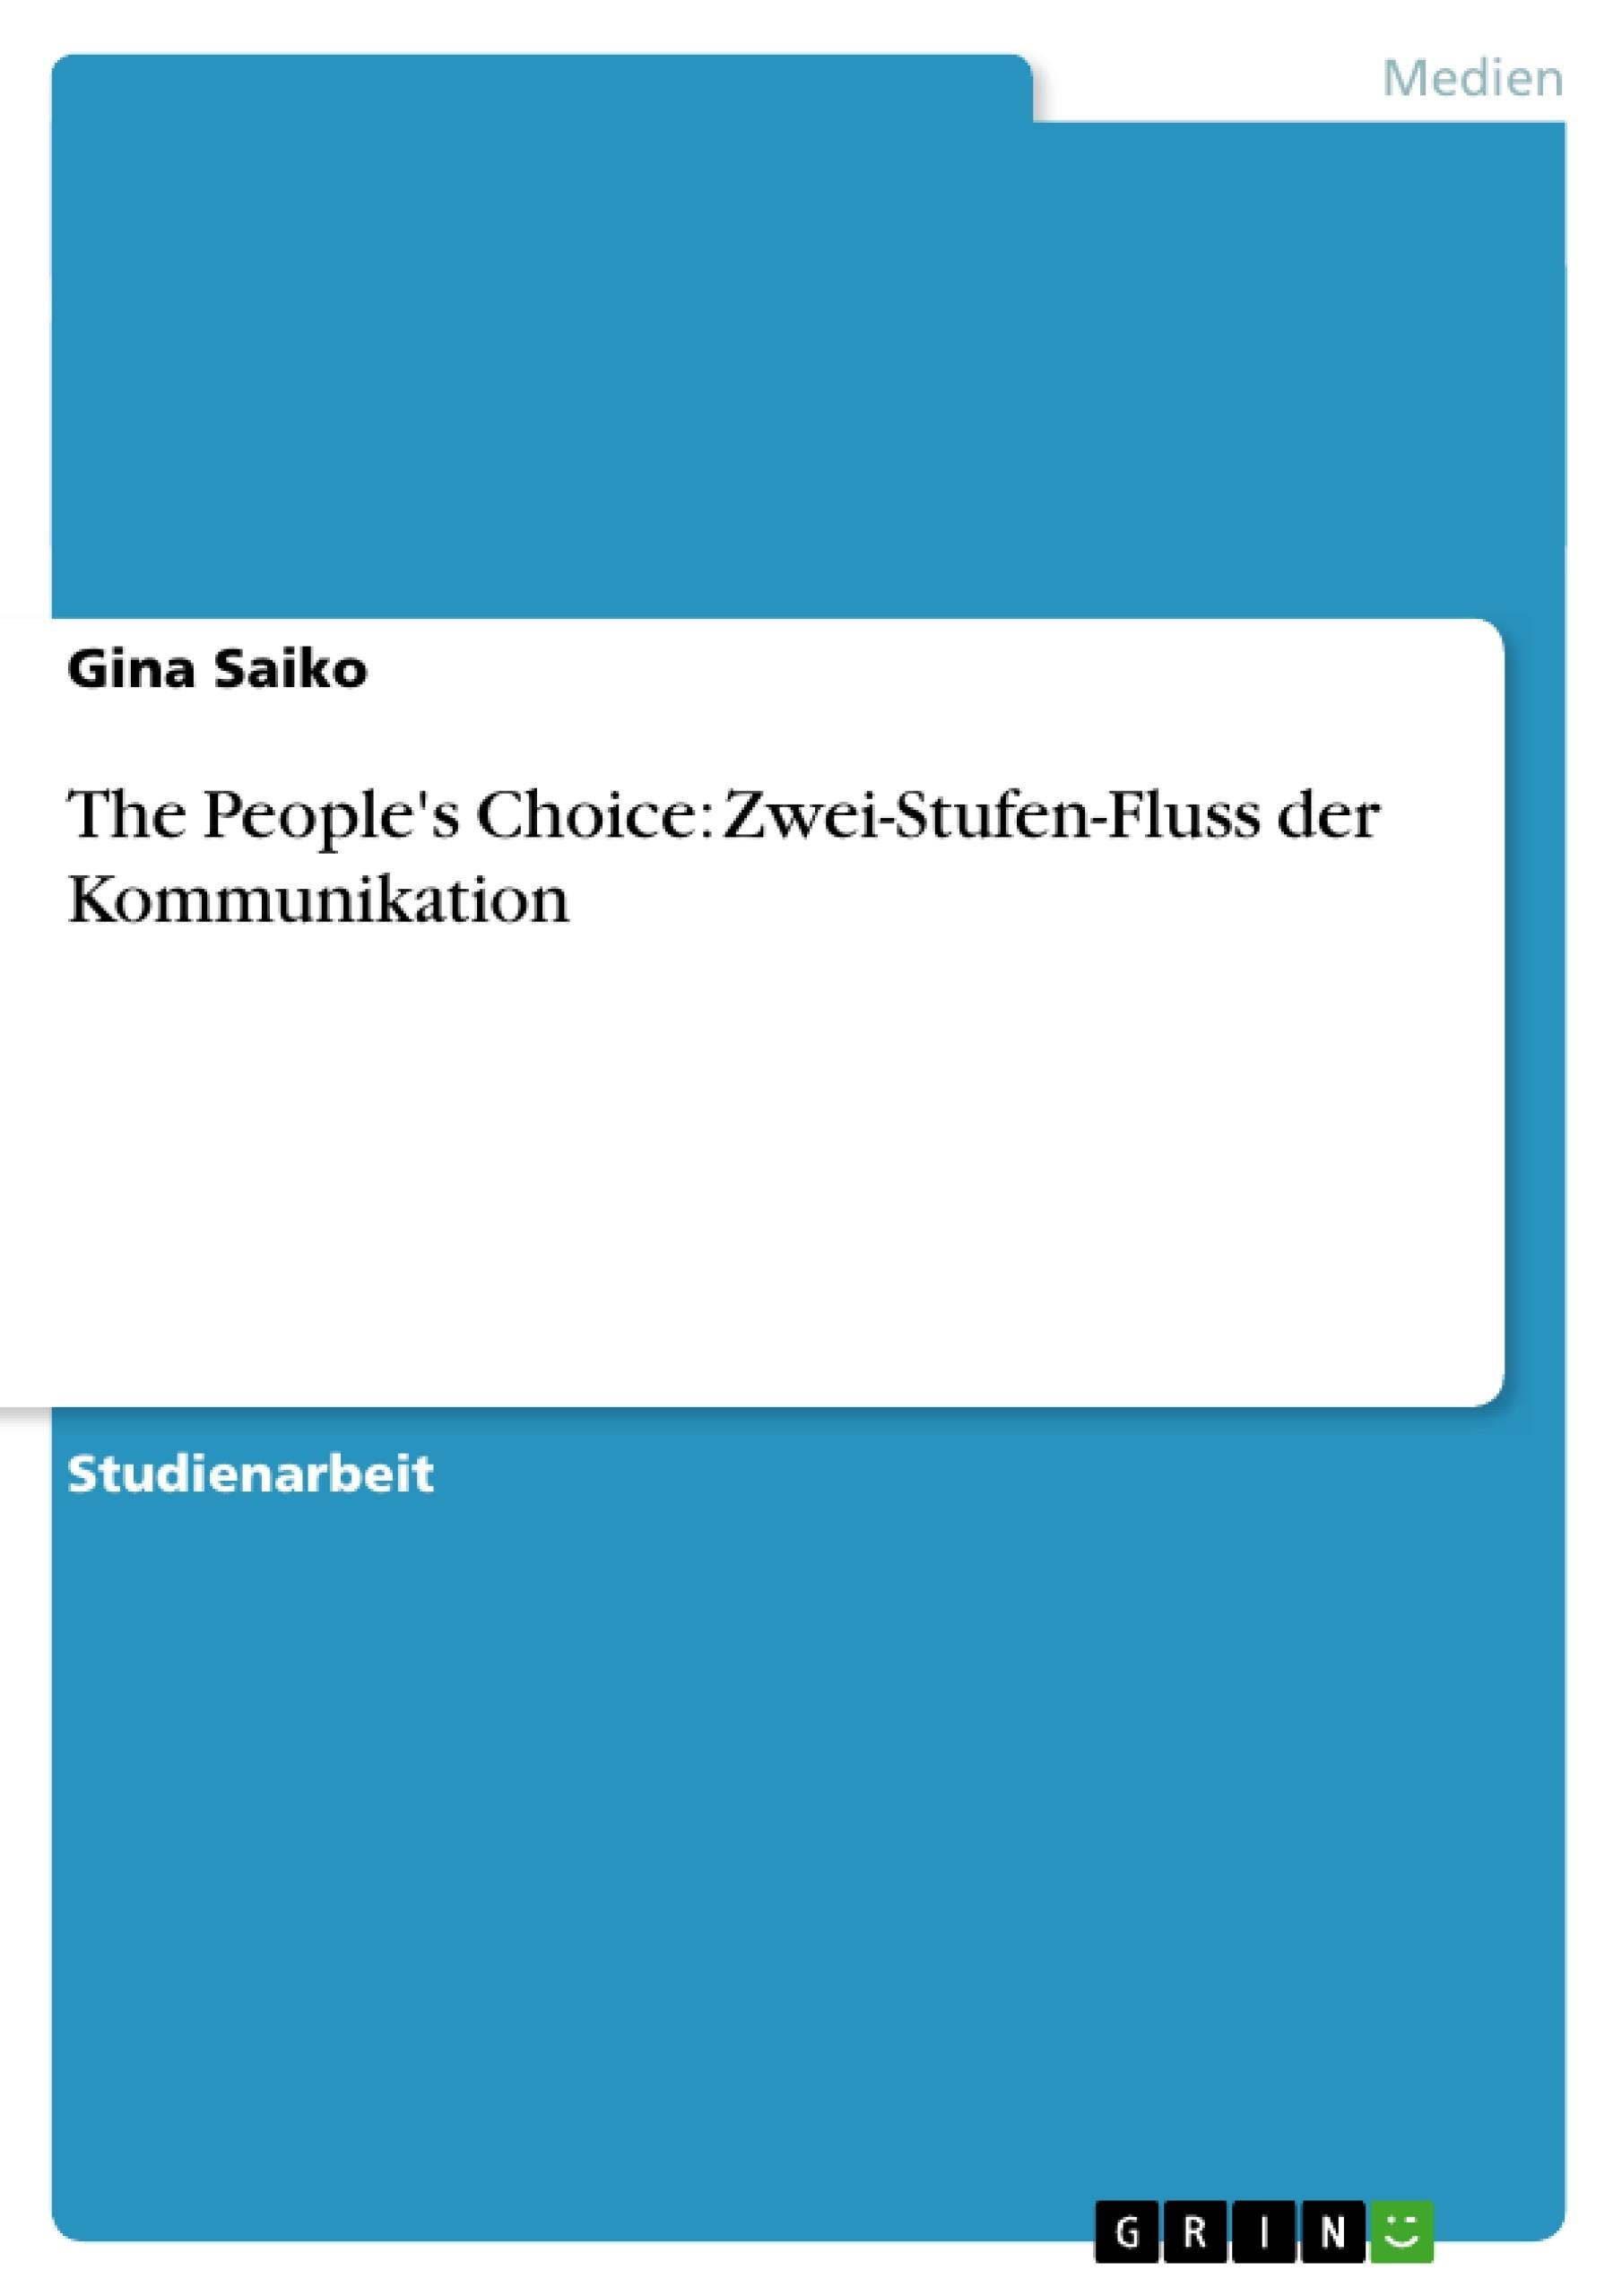 Titel: The People's Choice:  Zwei-Stufen-Fluss der Kommunikation